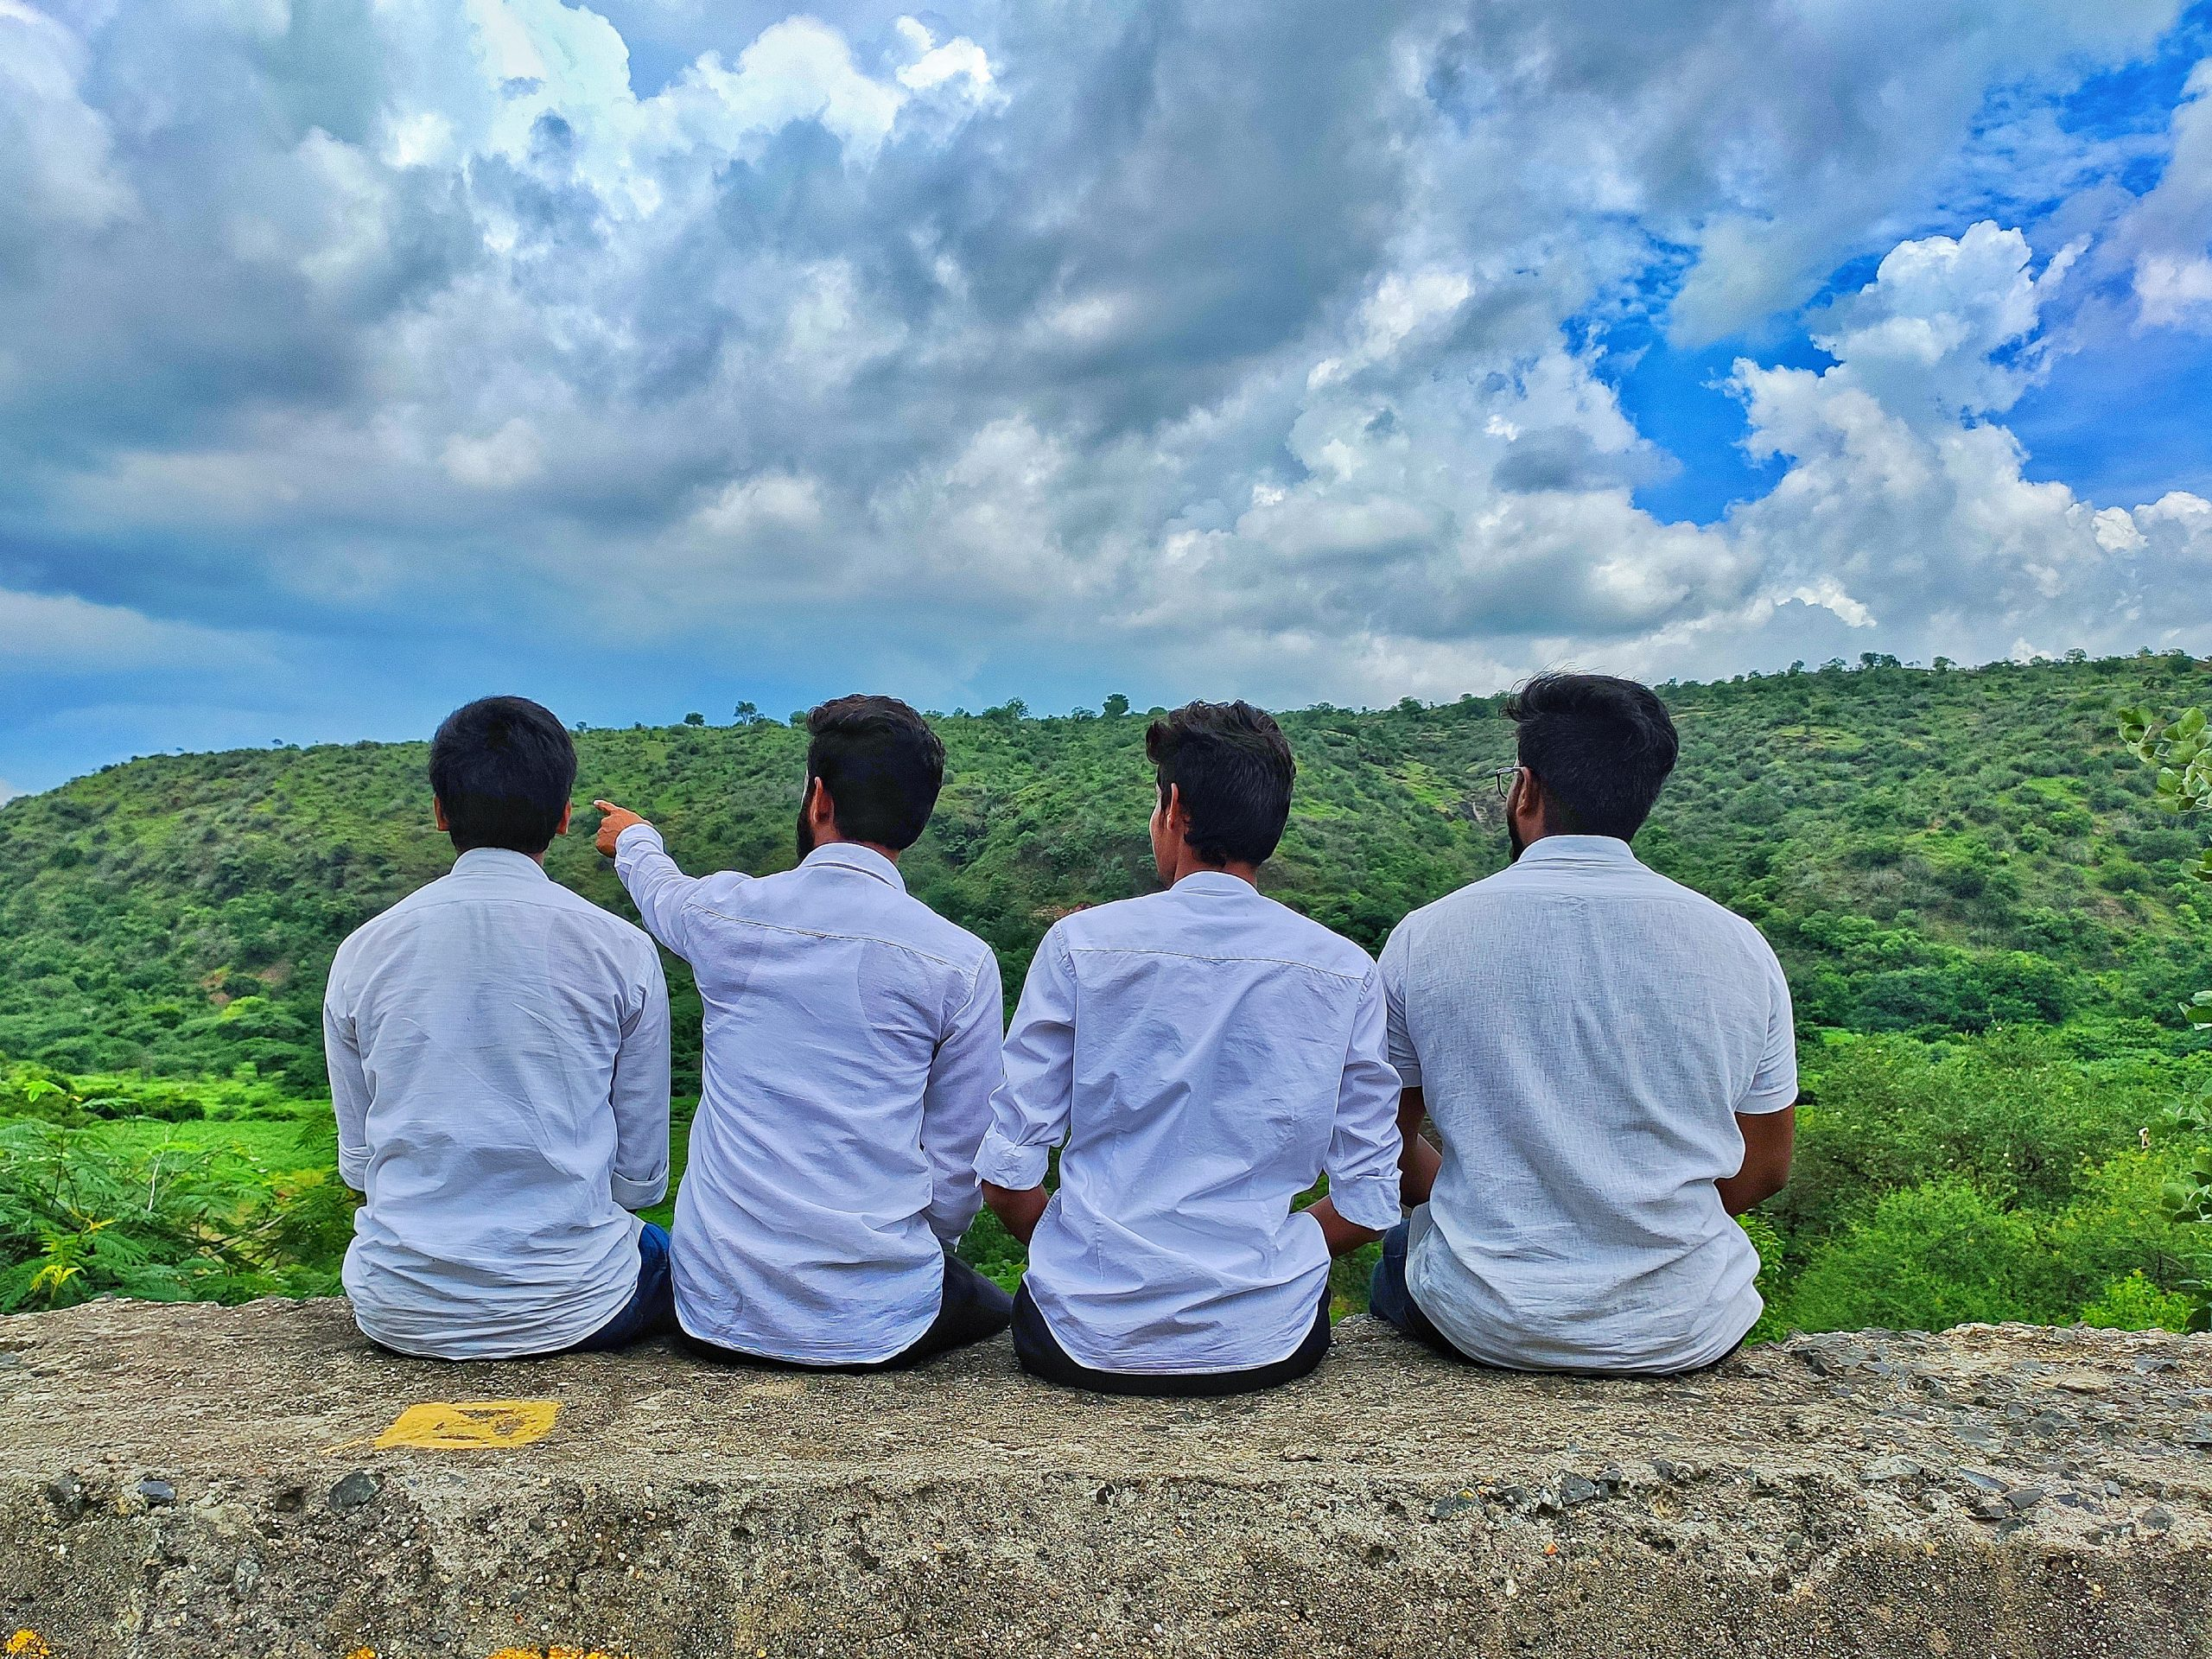 friends admiring nature